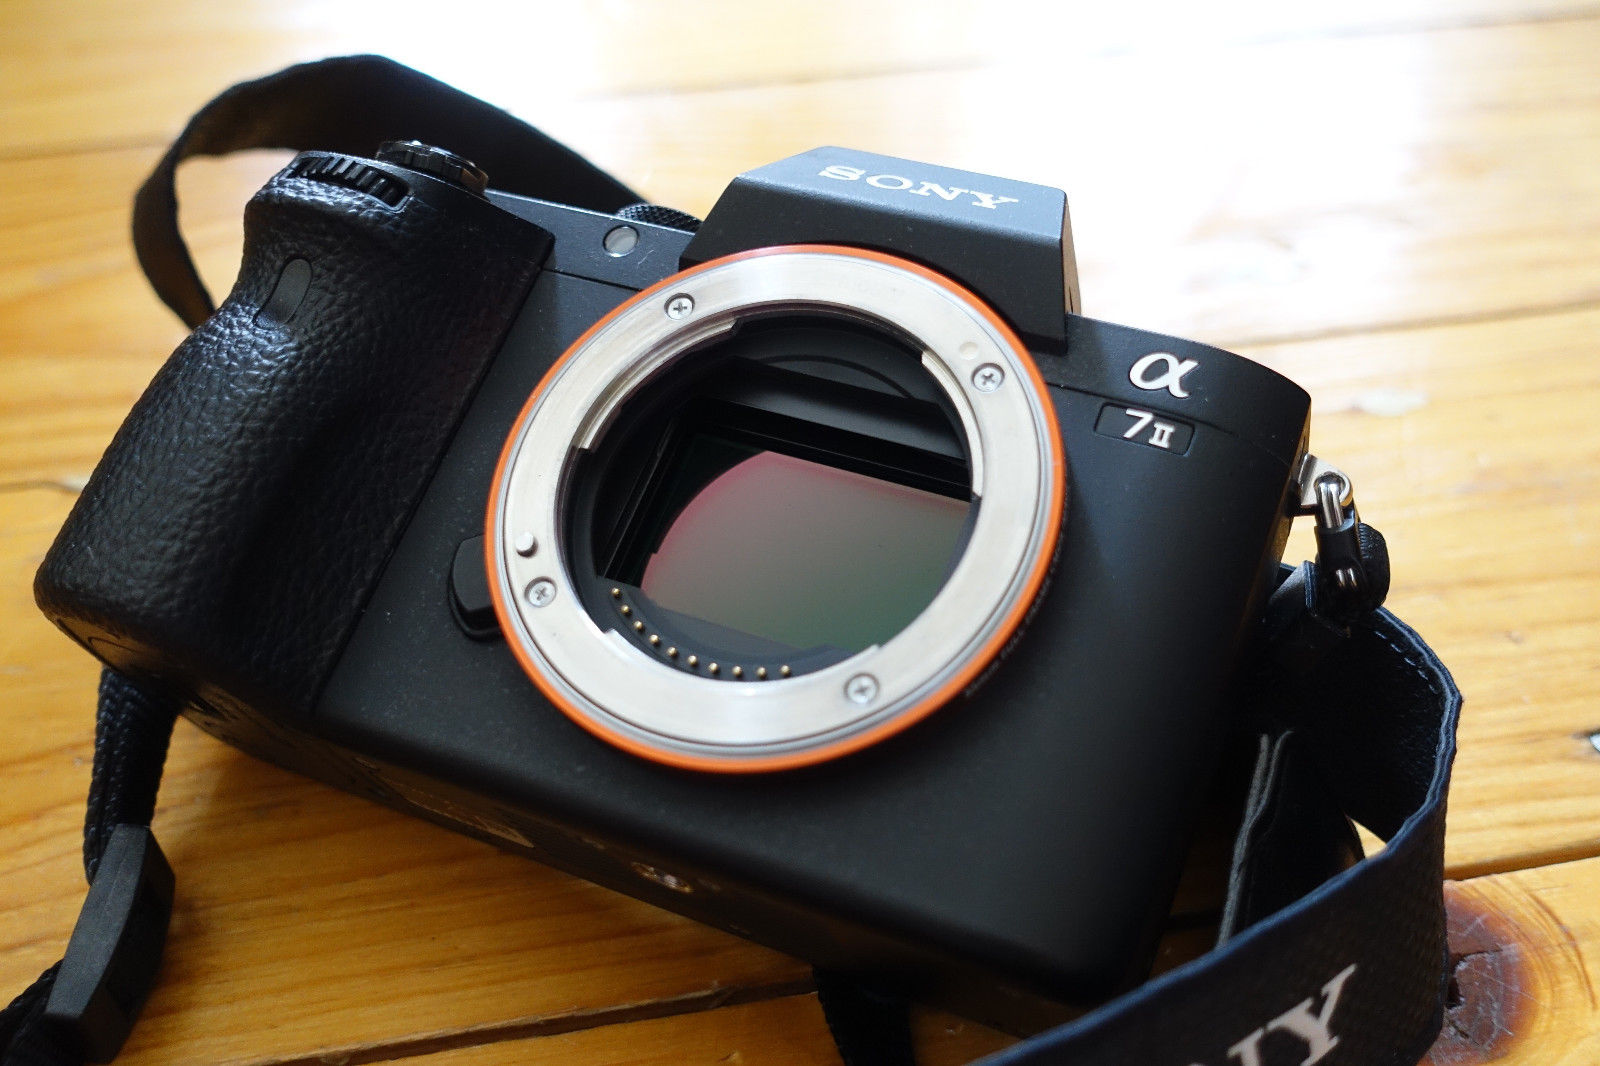 Sony Alpha A7M2 ILCE-7M2 24,3 MP Digitalkamera - Schwarz, body,A7II,Vollformat,